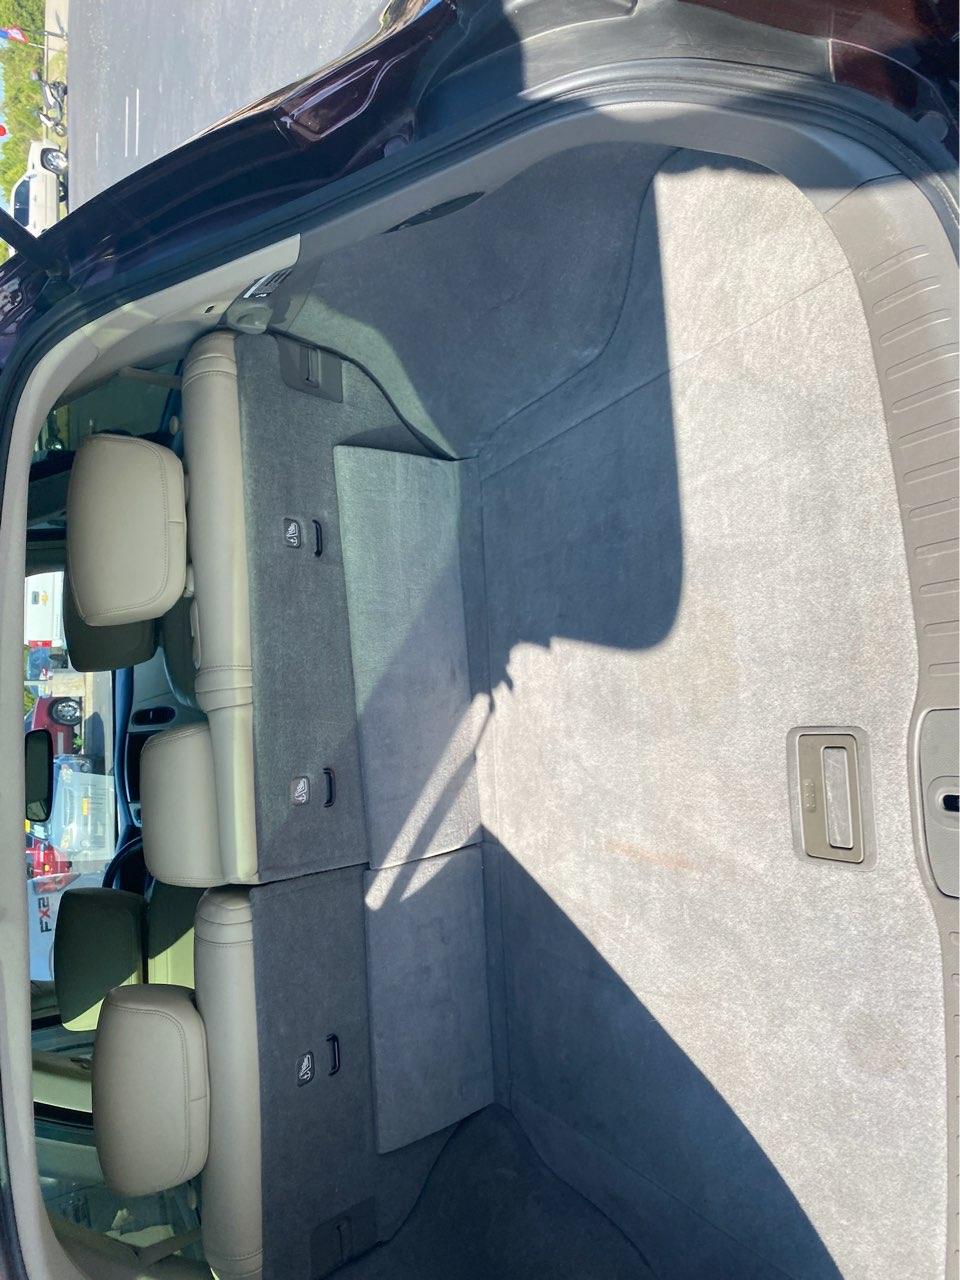 used vehicle - SUV INFINITI QX50 2016